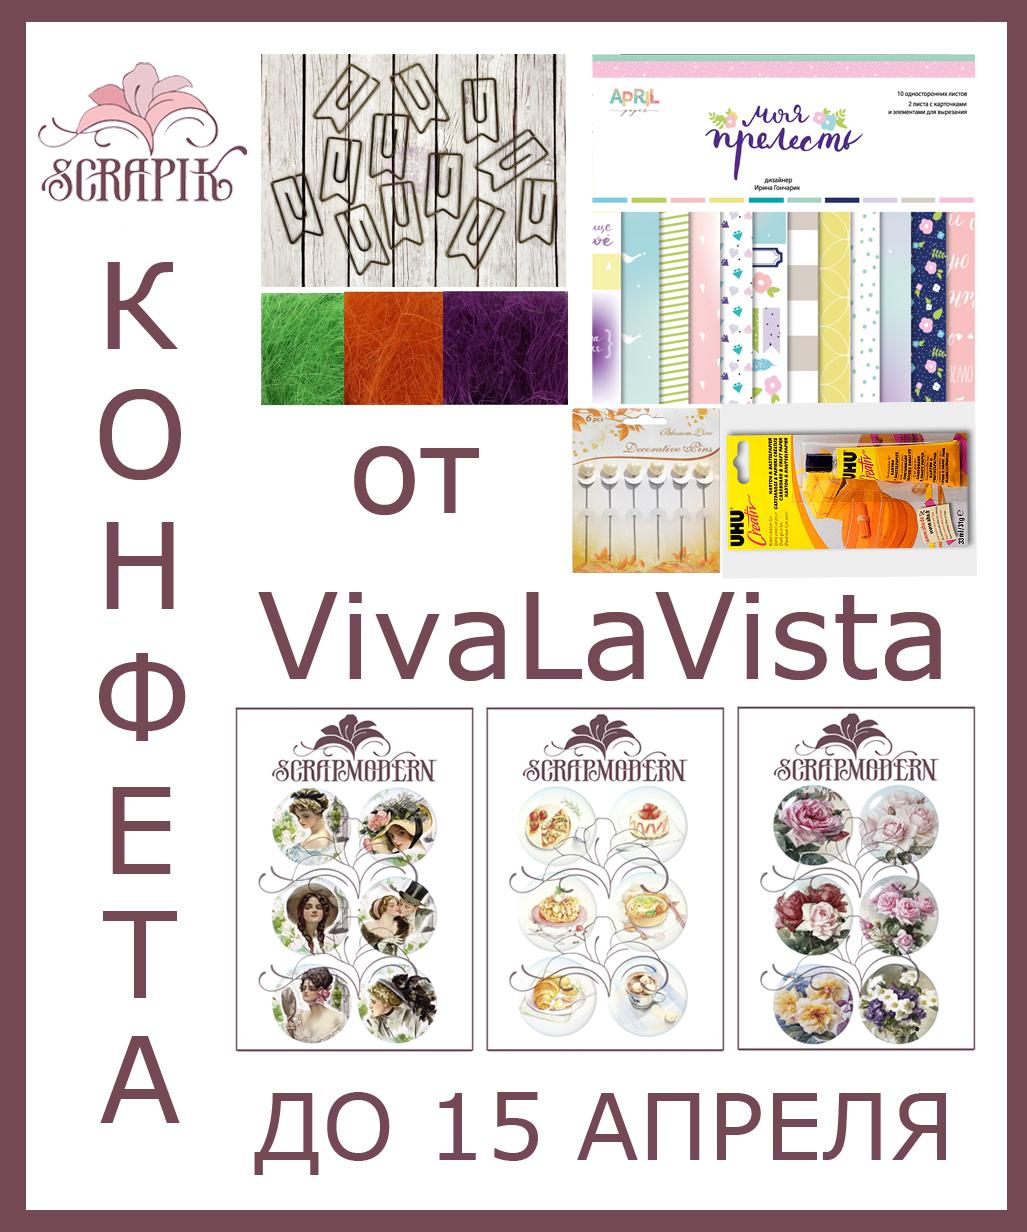 от блога Viva La Vista и магазина scrapik.ru